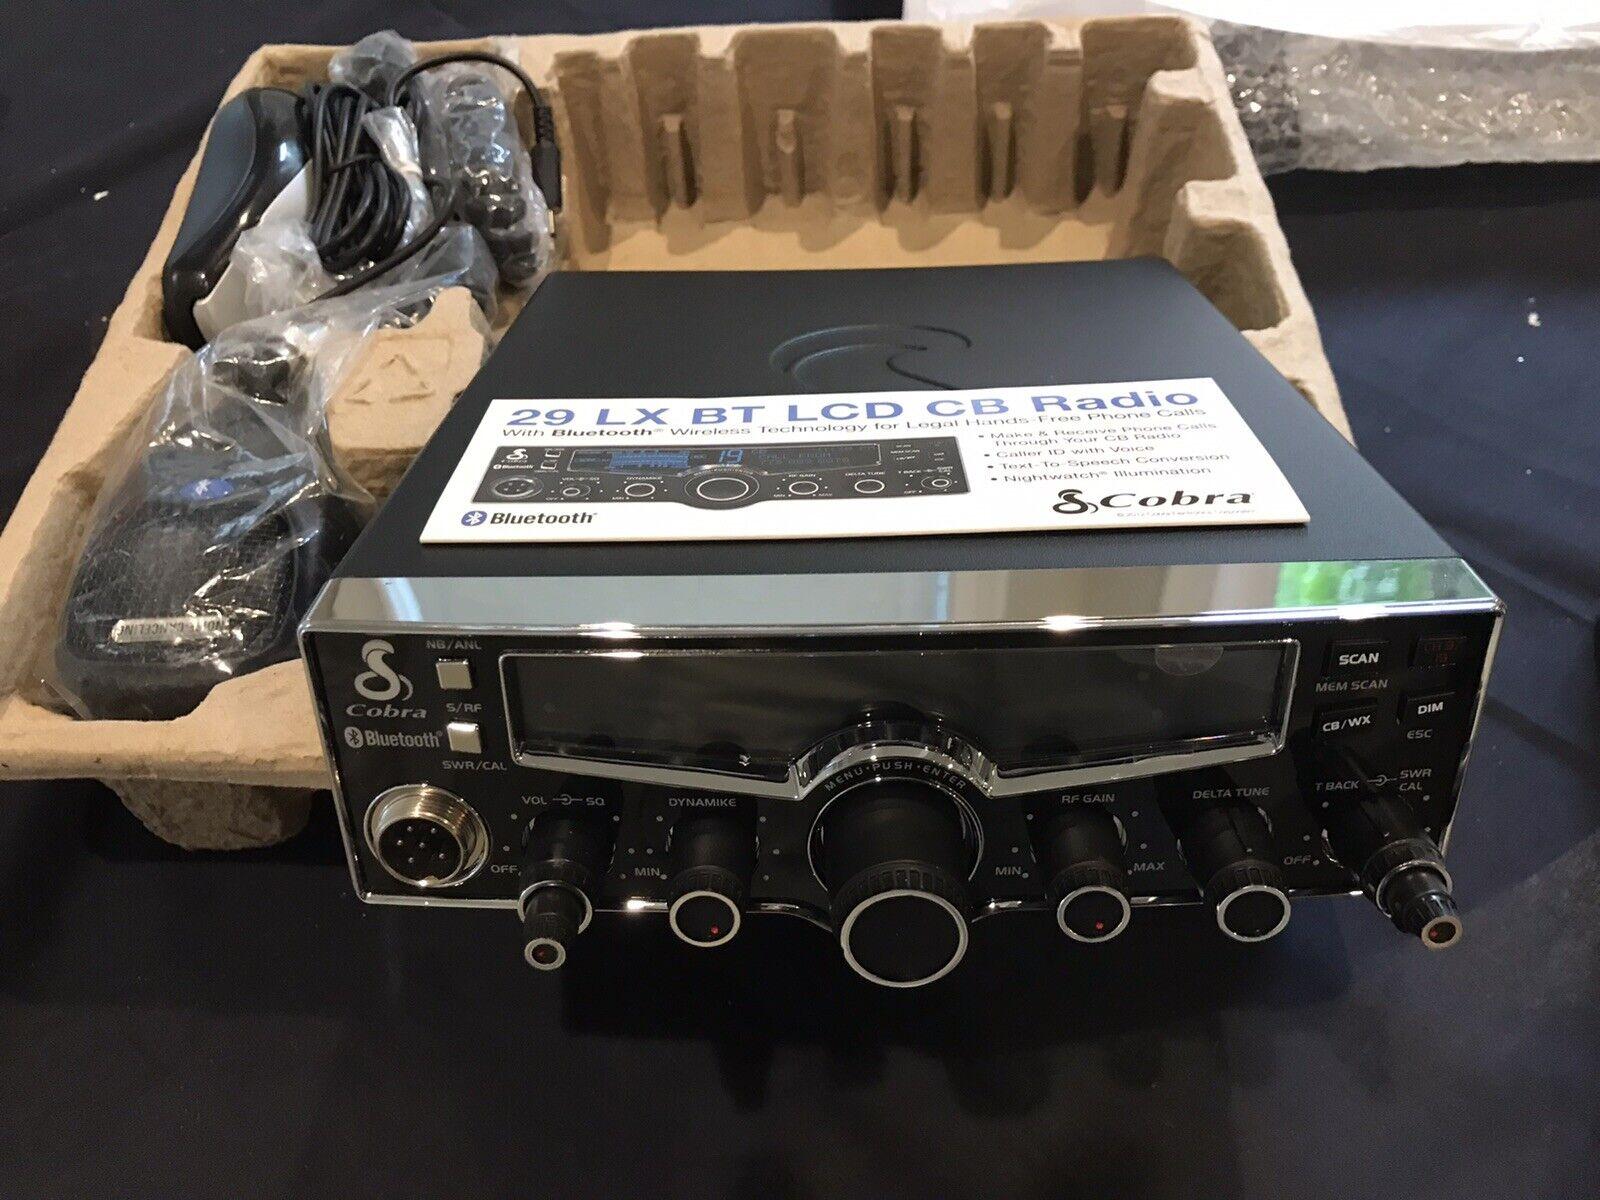 Cobra 29 LX BT - ASYMOD - Hi-Fi STUDIO MODULATION UPGRADE. Available Now for 425.00